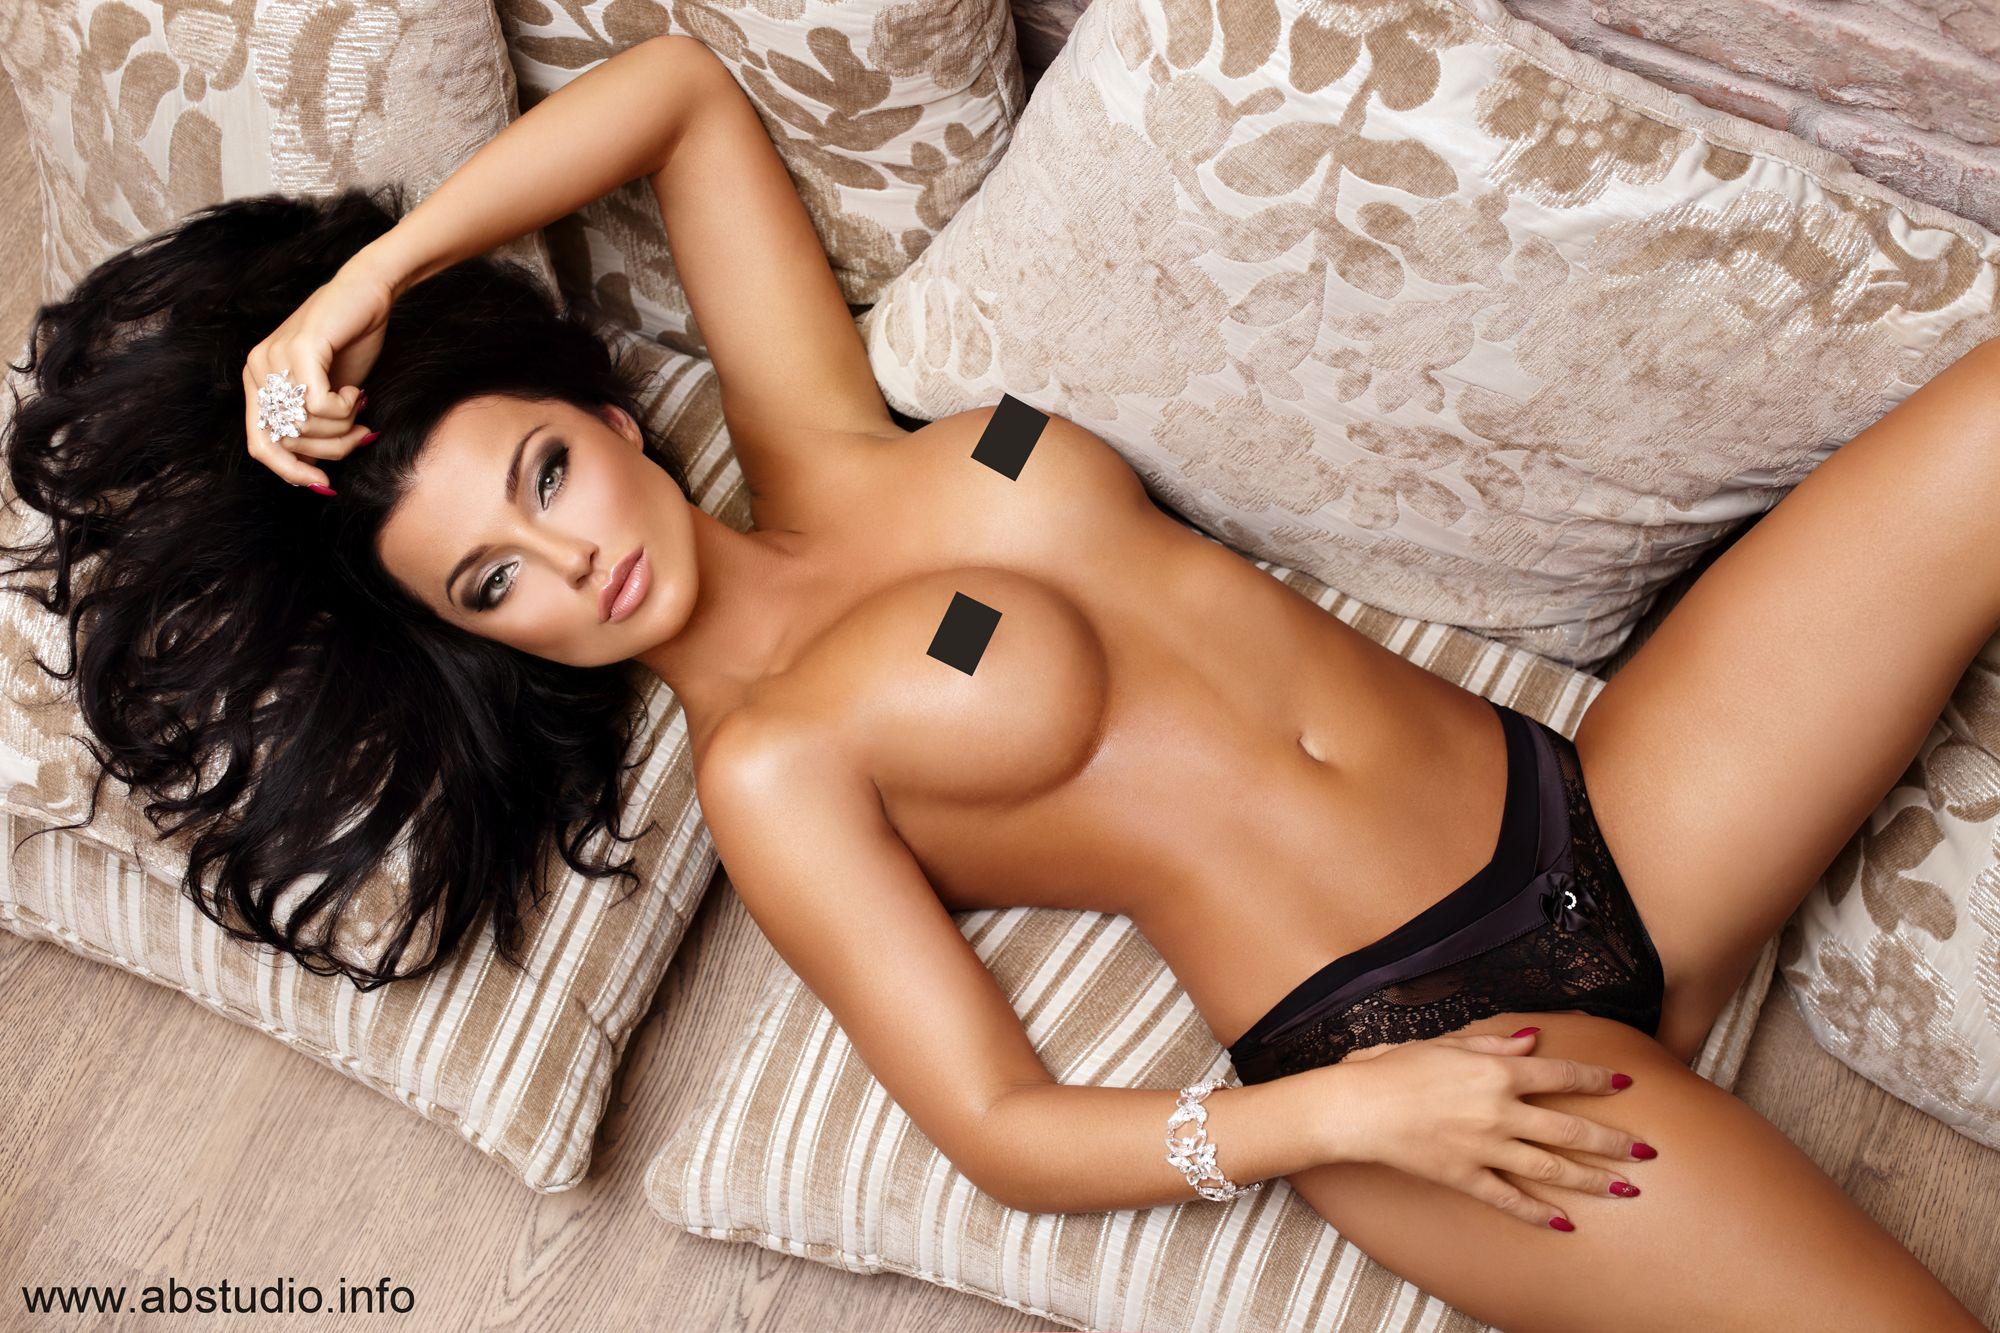 Nude hot video strip